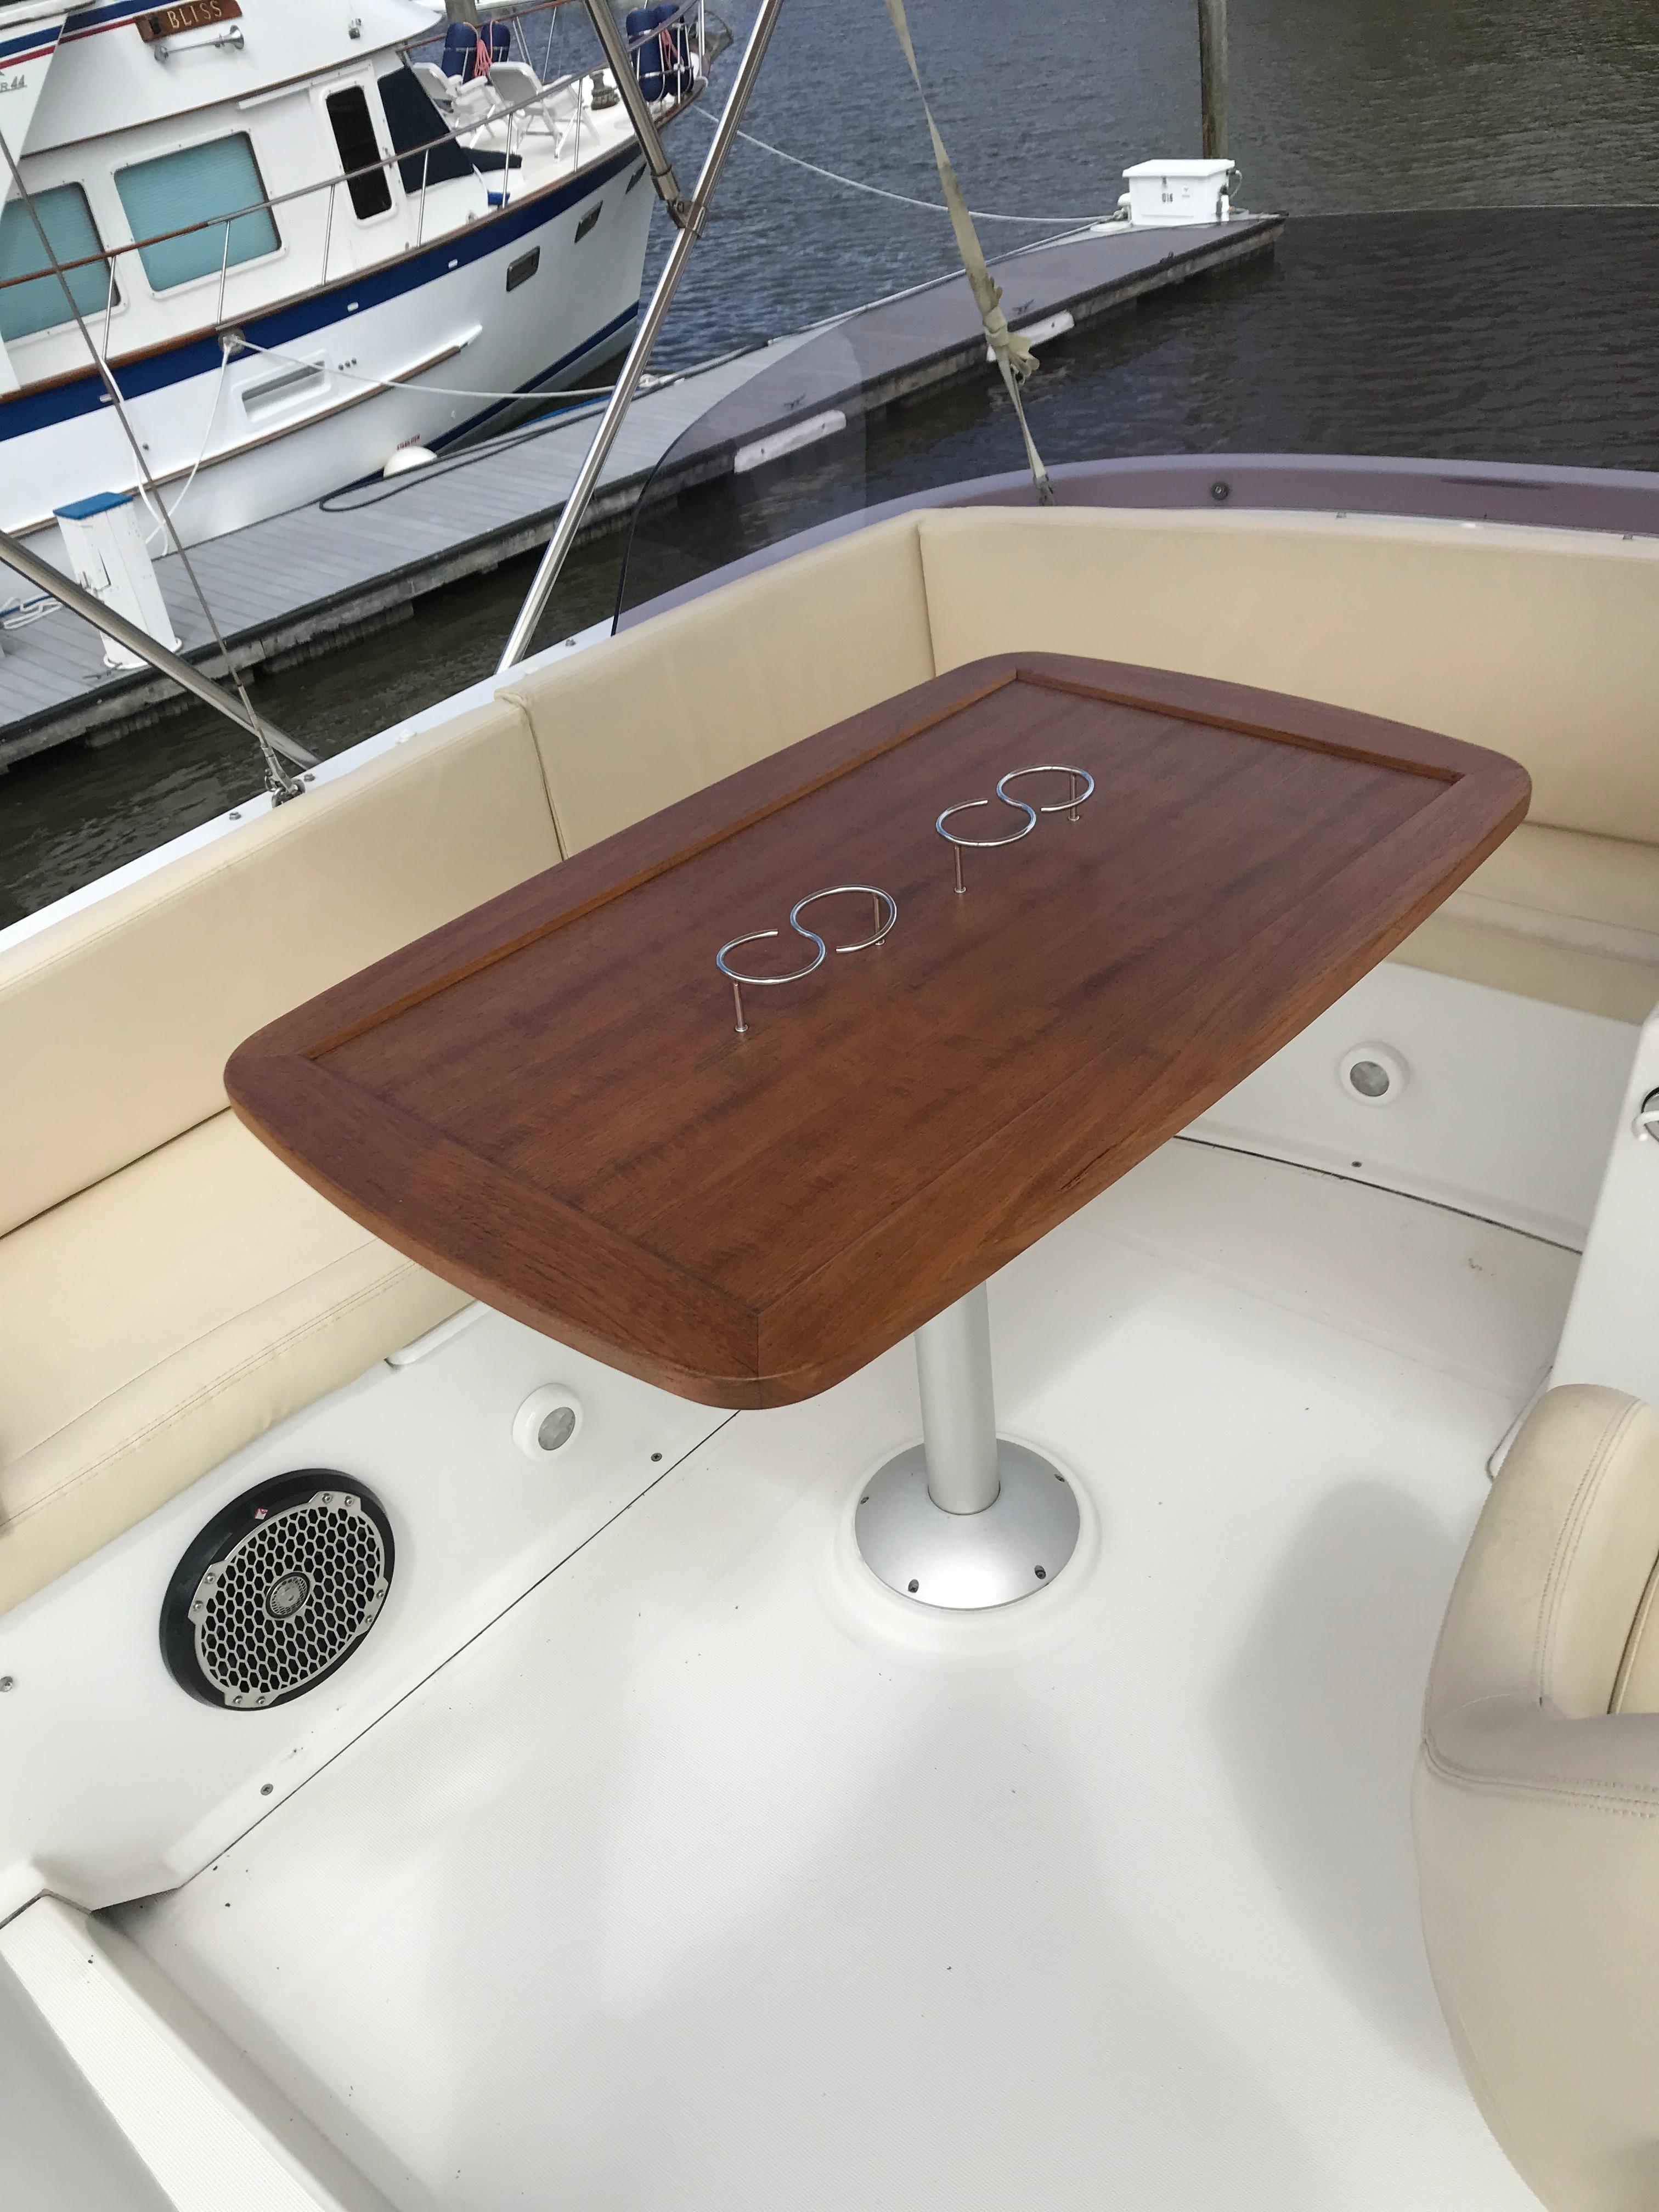 Beneteau 34 Swift Trawler - Teak Table/Speakers/LED Lighting